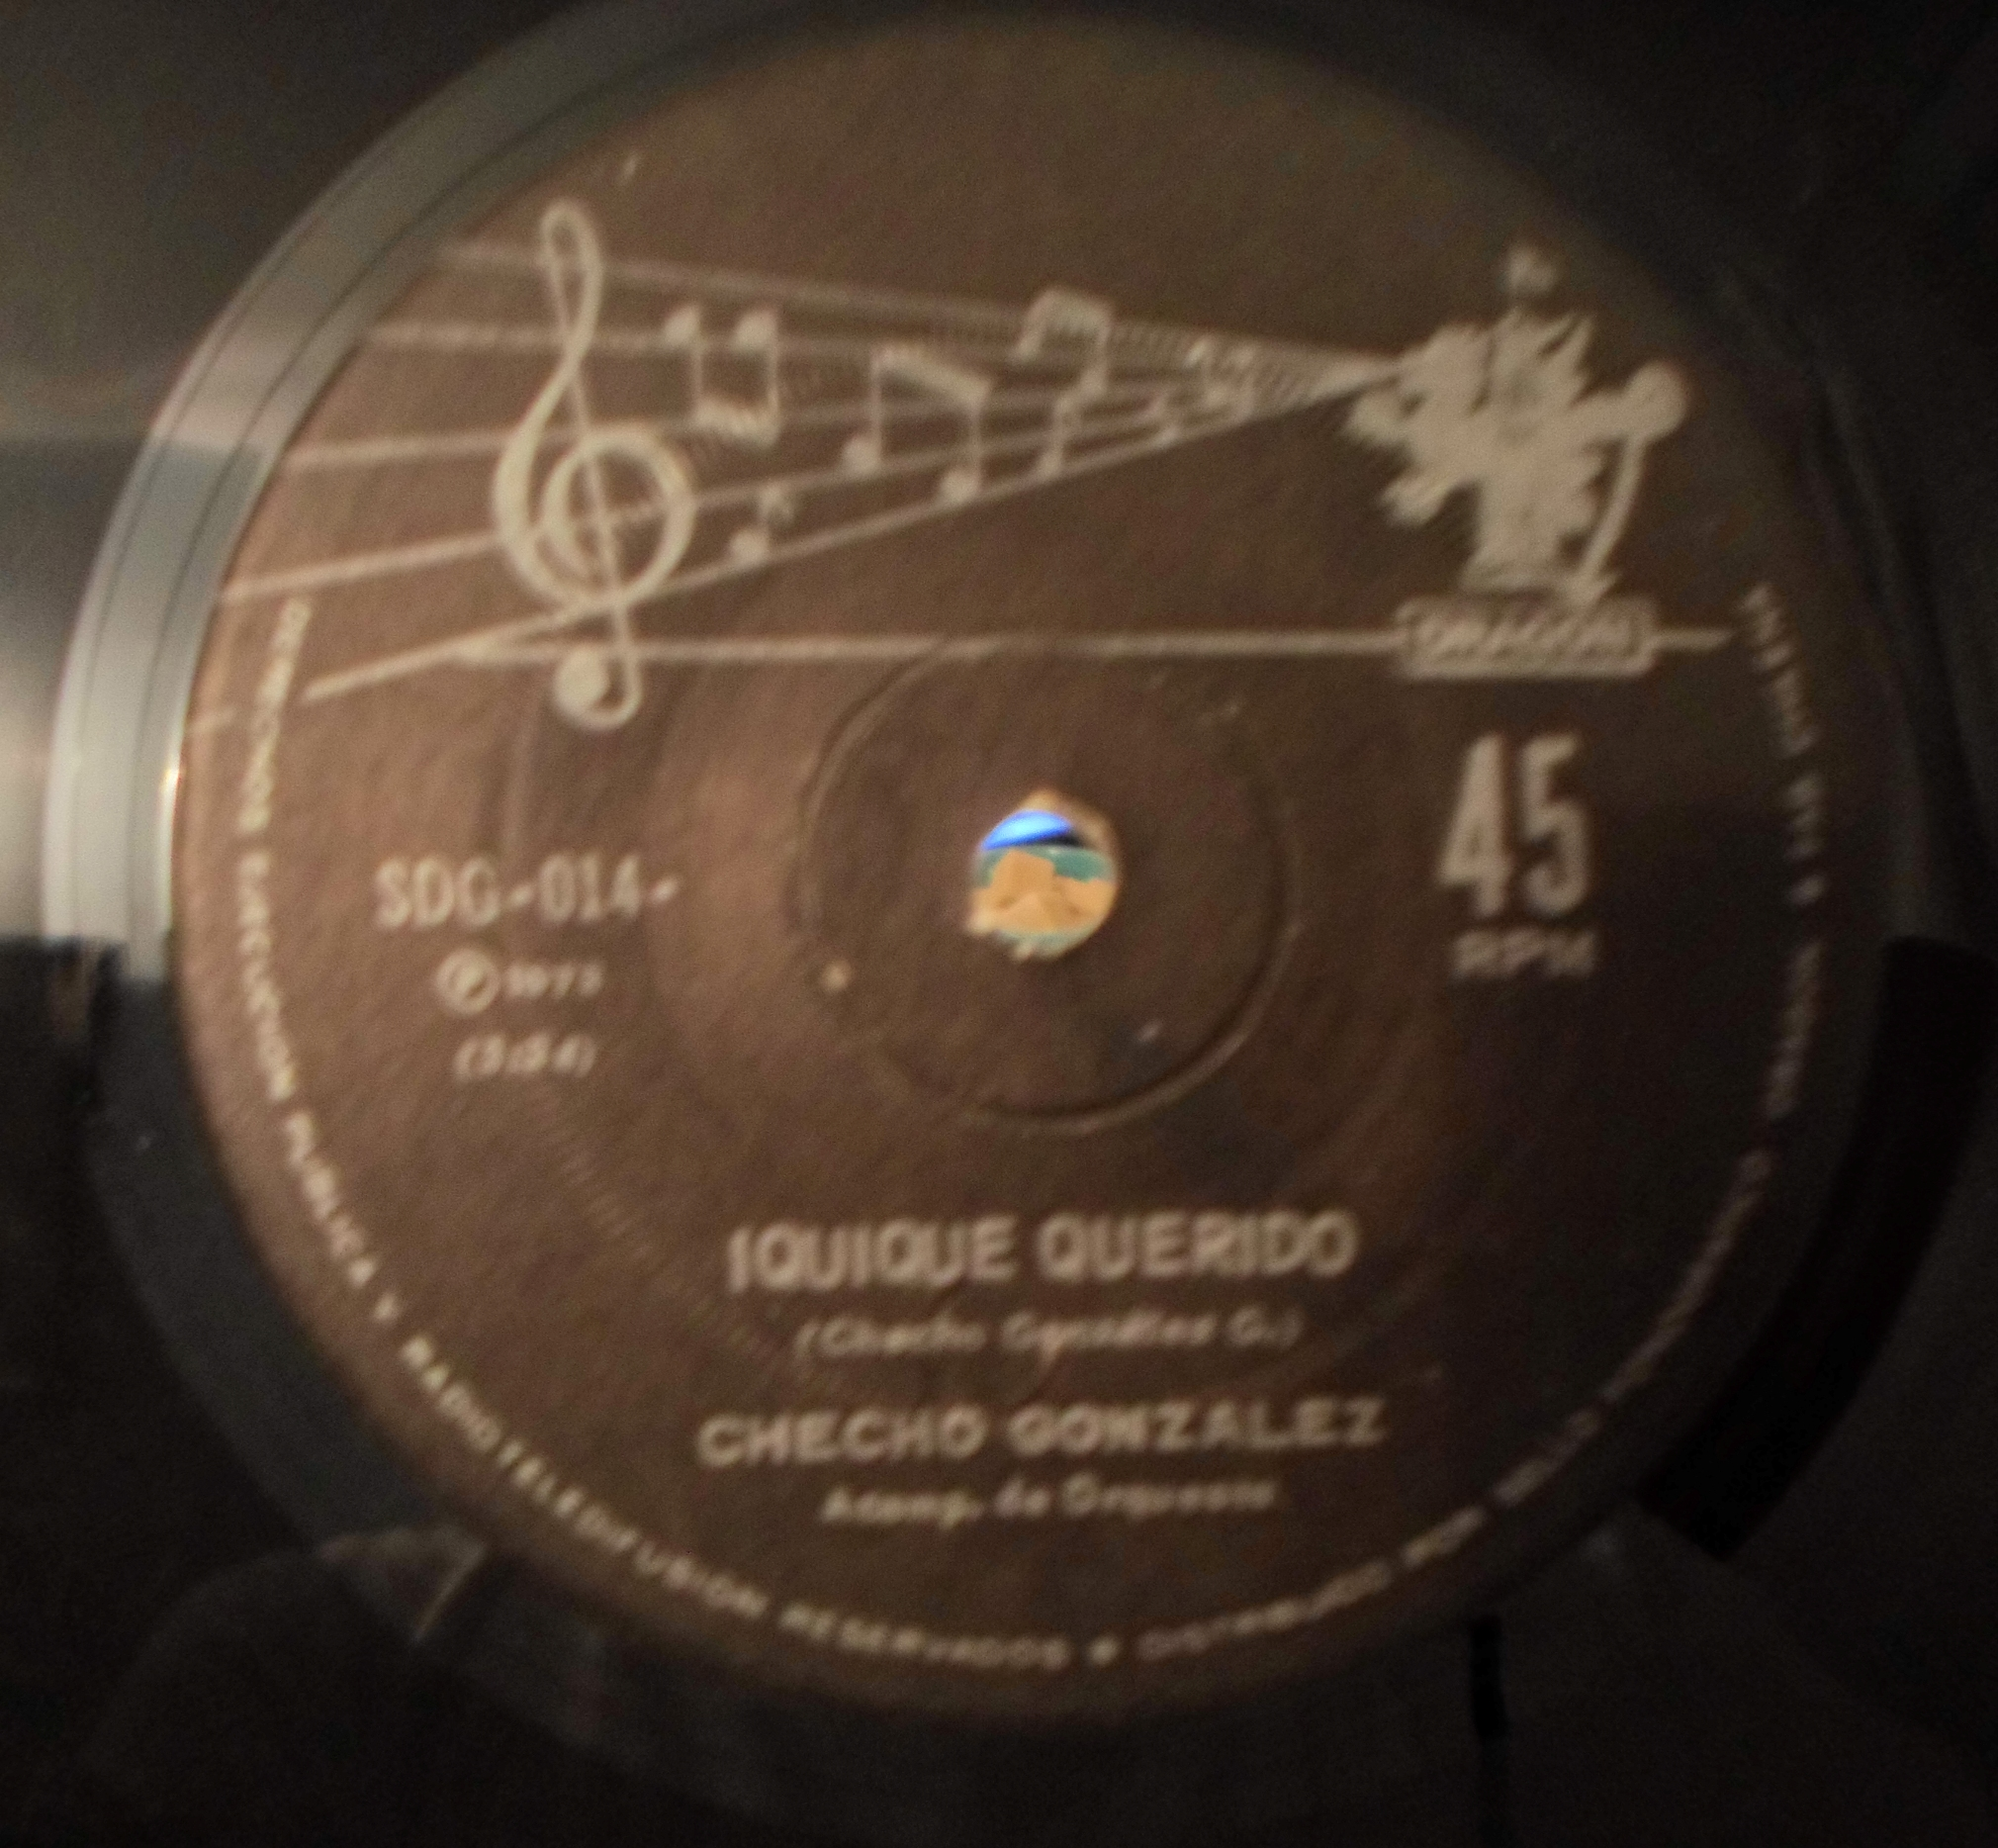 Checho González